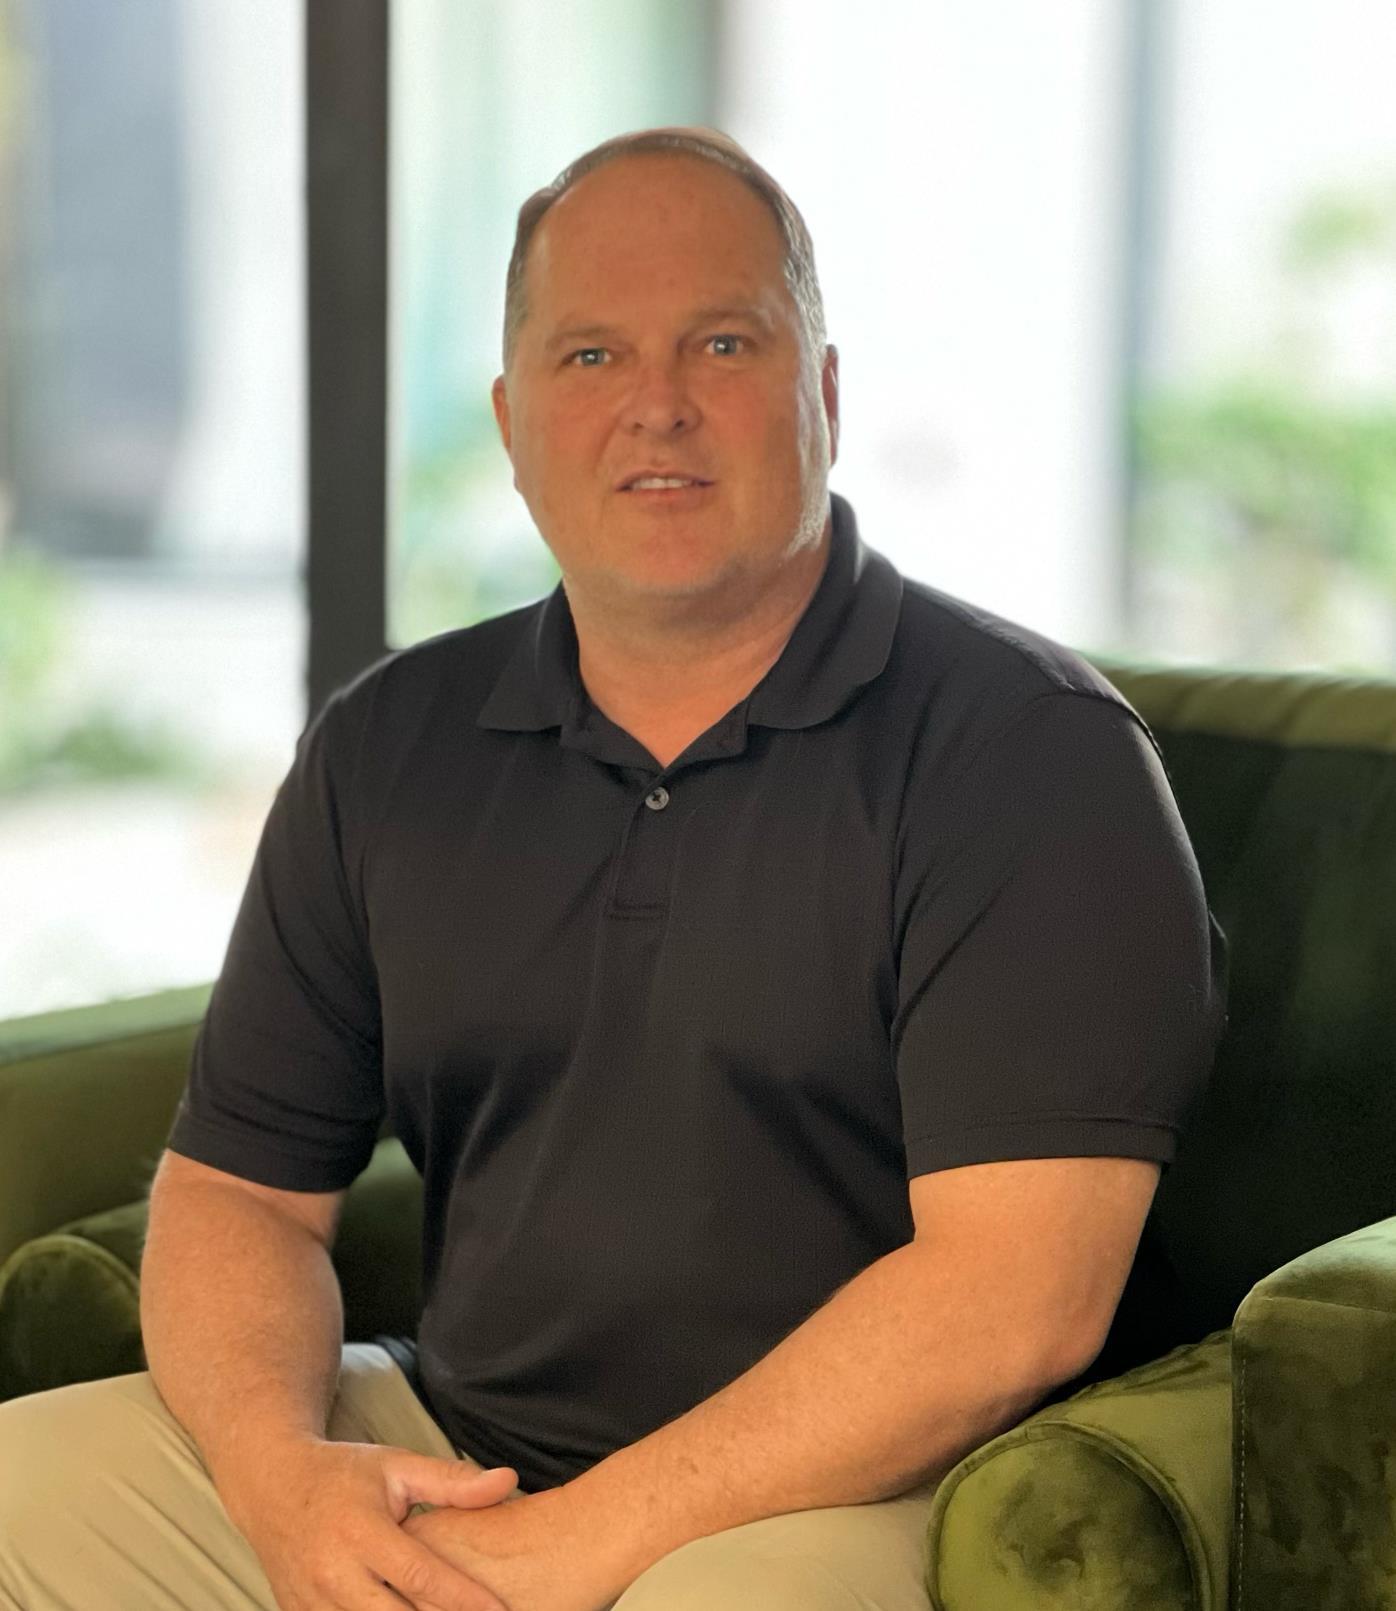 Sean Sean is a licensed real estate agent in Yuma AZ